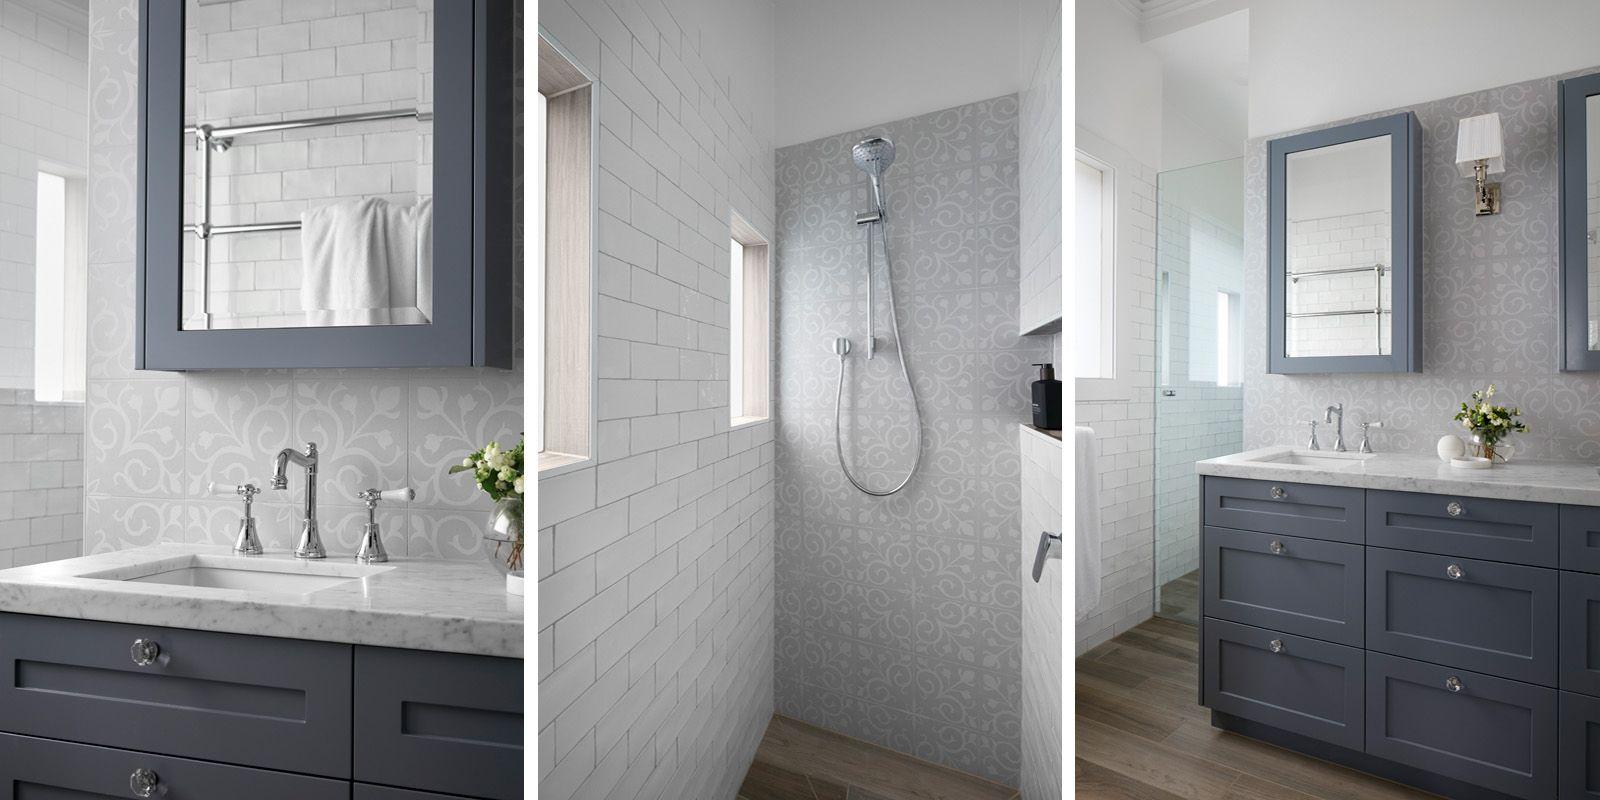 Brighton Home 2 Ensuite Powder Room Laundry Sb Brighton Houses Hampton Style Bathrooms Bathroom Styling